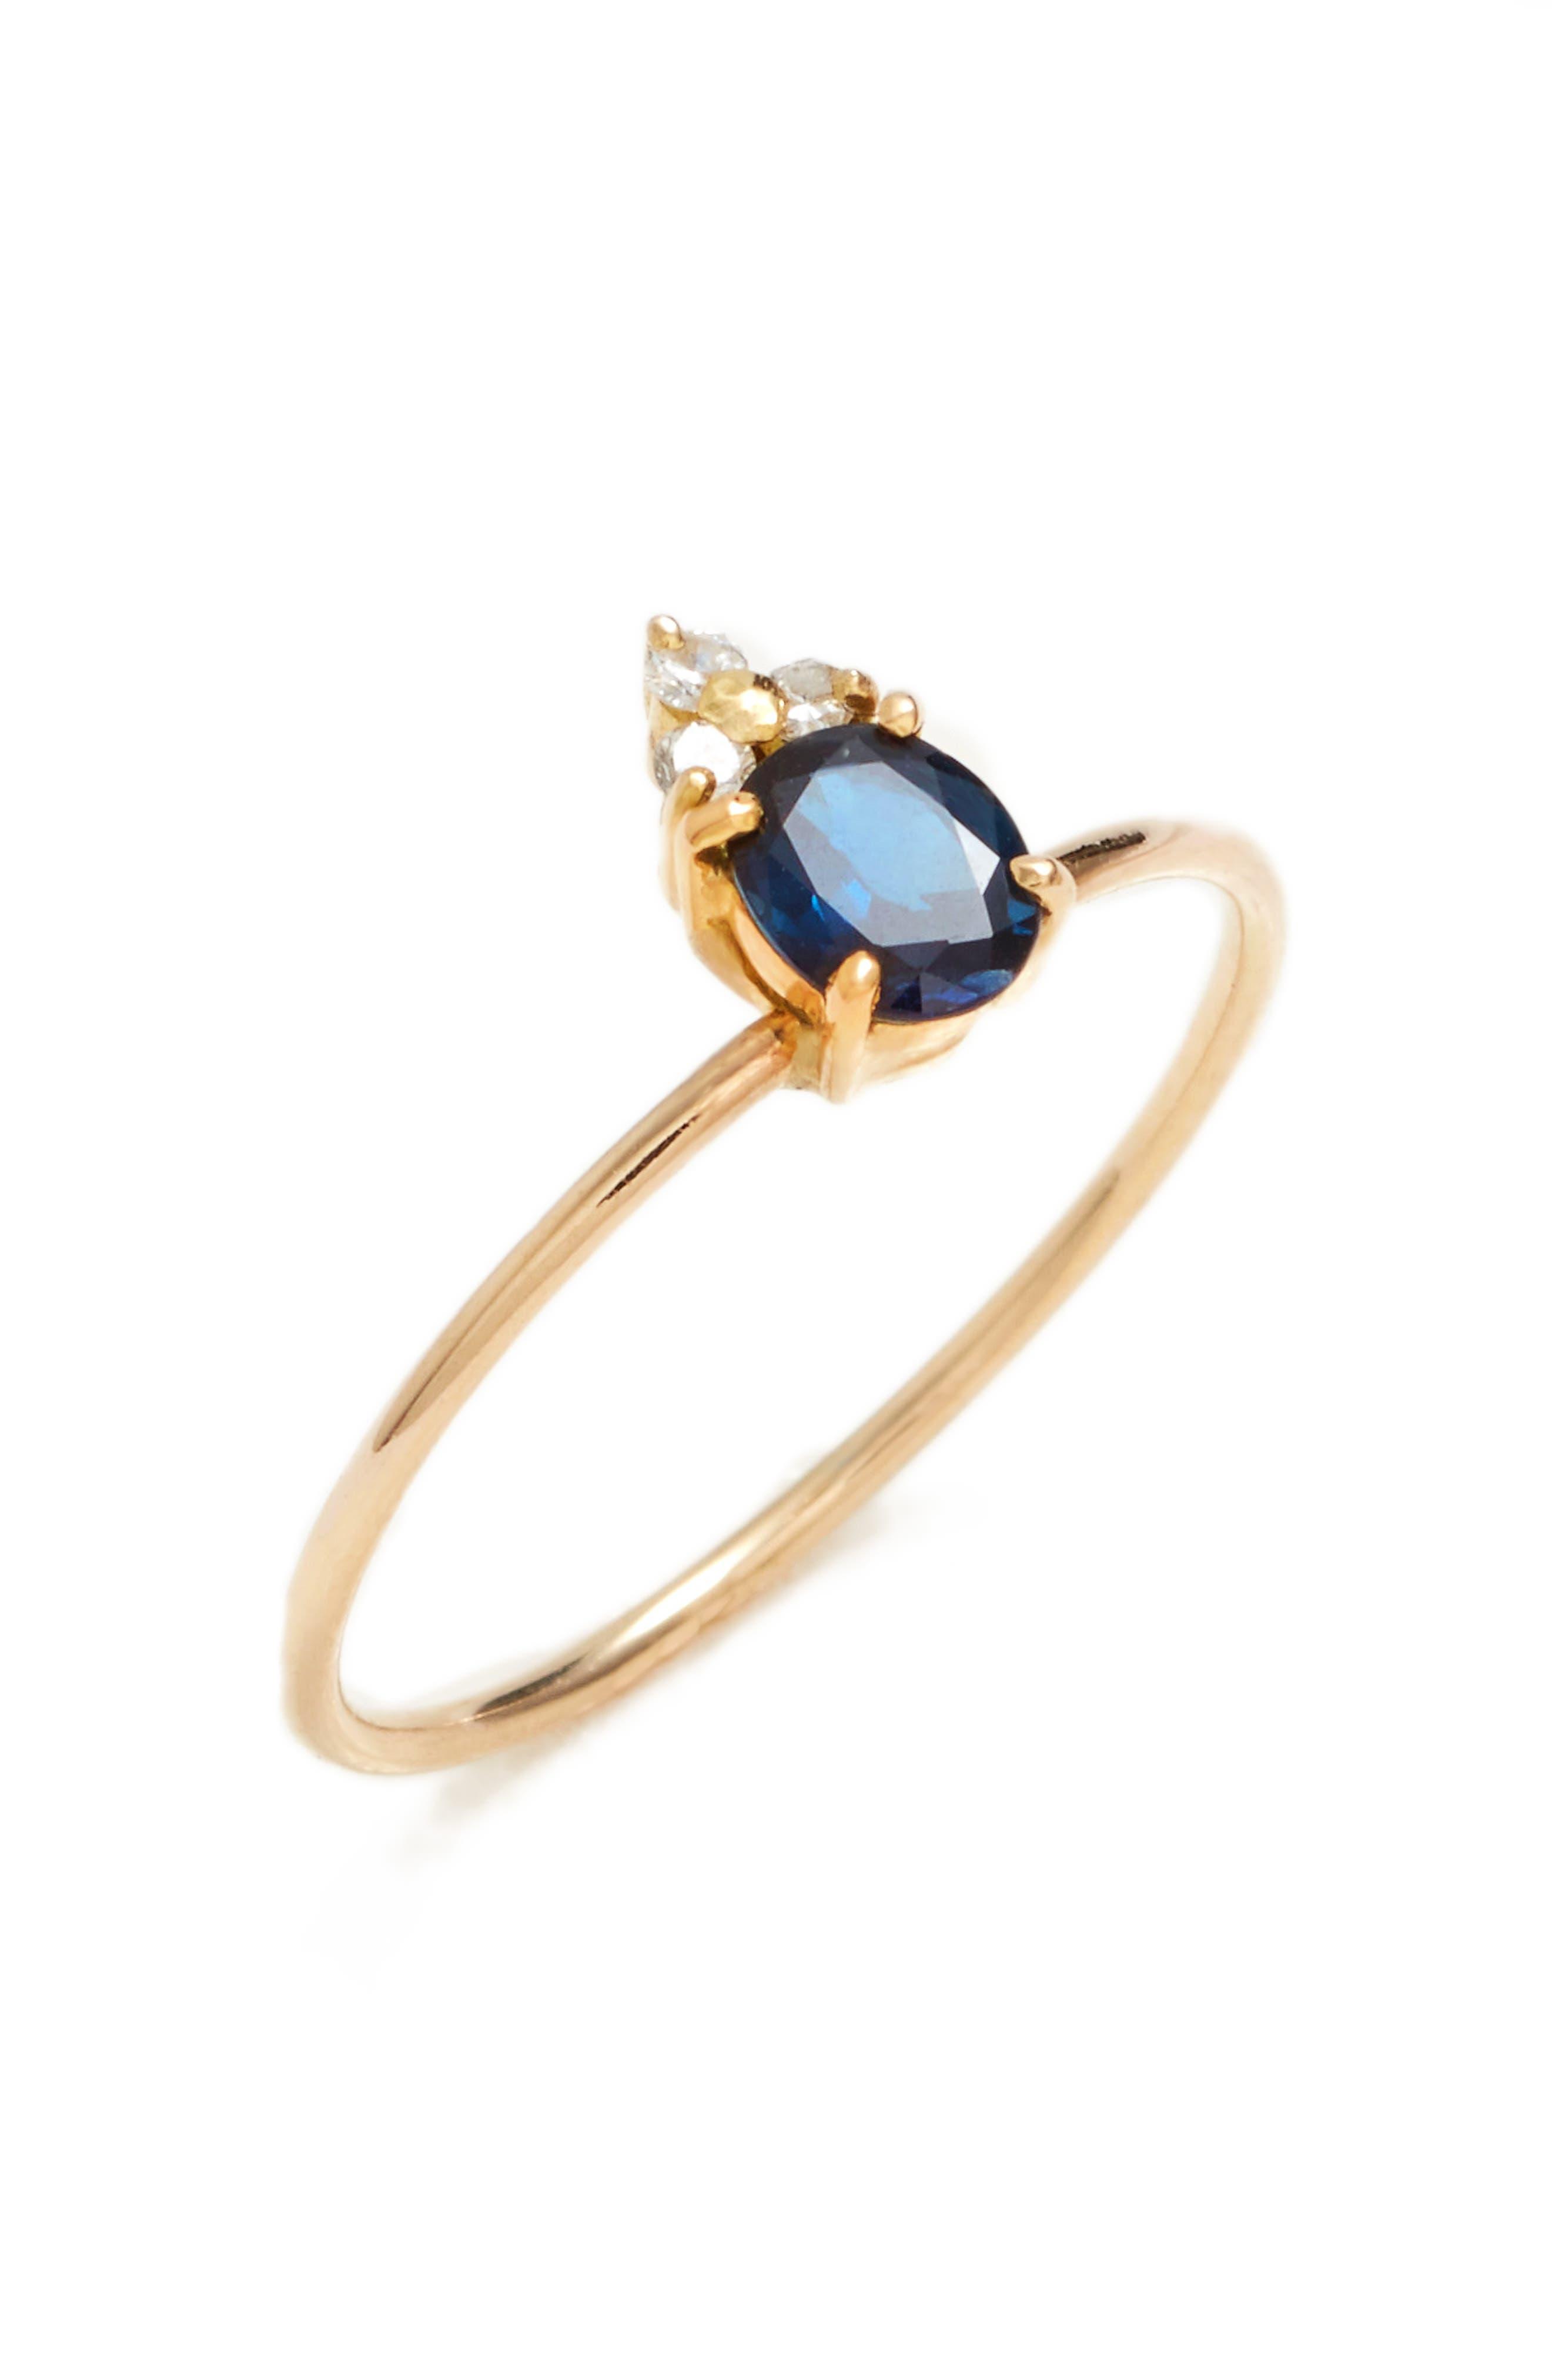 Poppy Finch Skinny Stone Sapphire & Diamond Ring